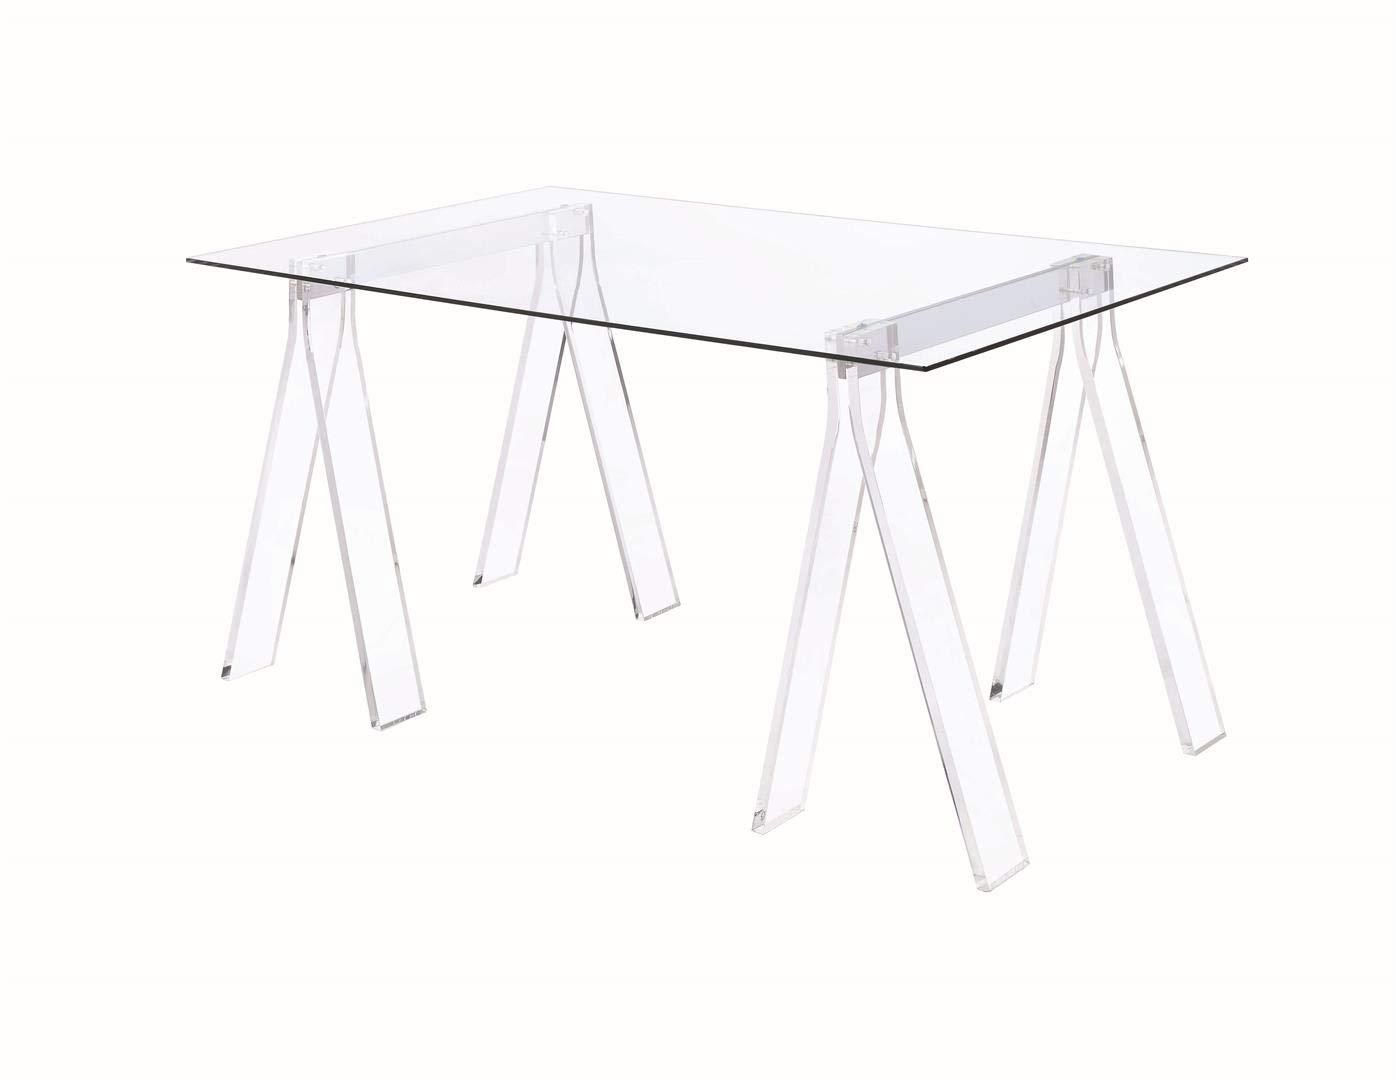 Coaster Home Furnishings 801535 Coaster Amaturo Contemporary Clear Acrylic Sawhorse Writing Desk, 31.5x59x30, Glass by Coaster Home Furnishings